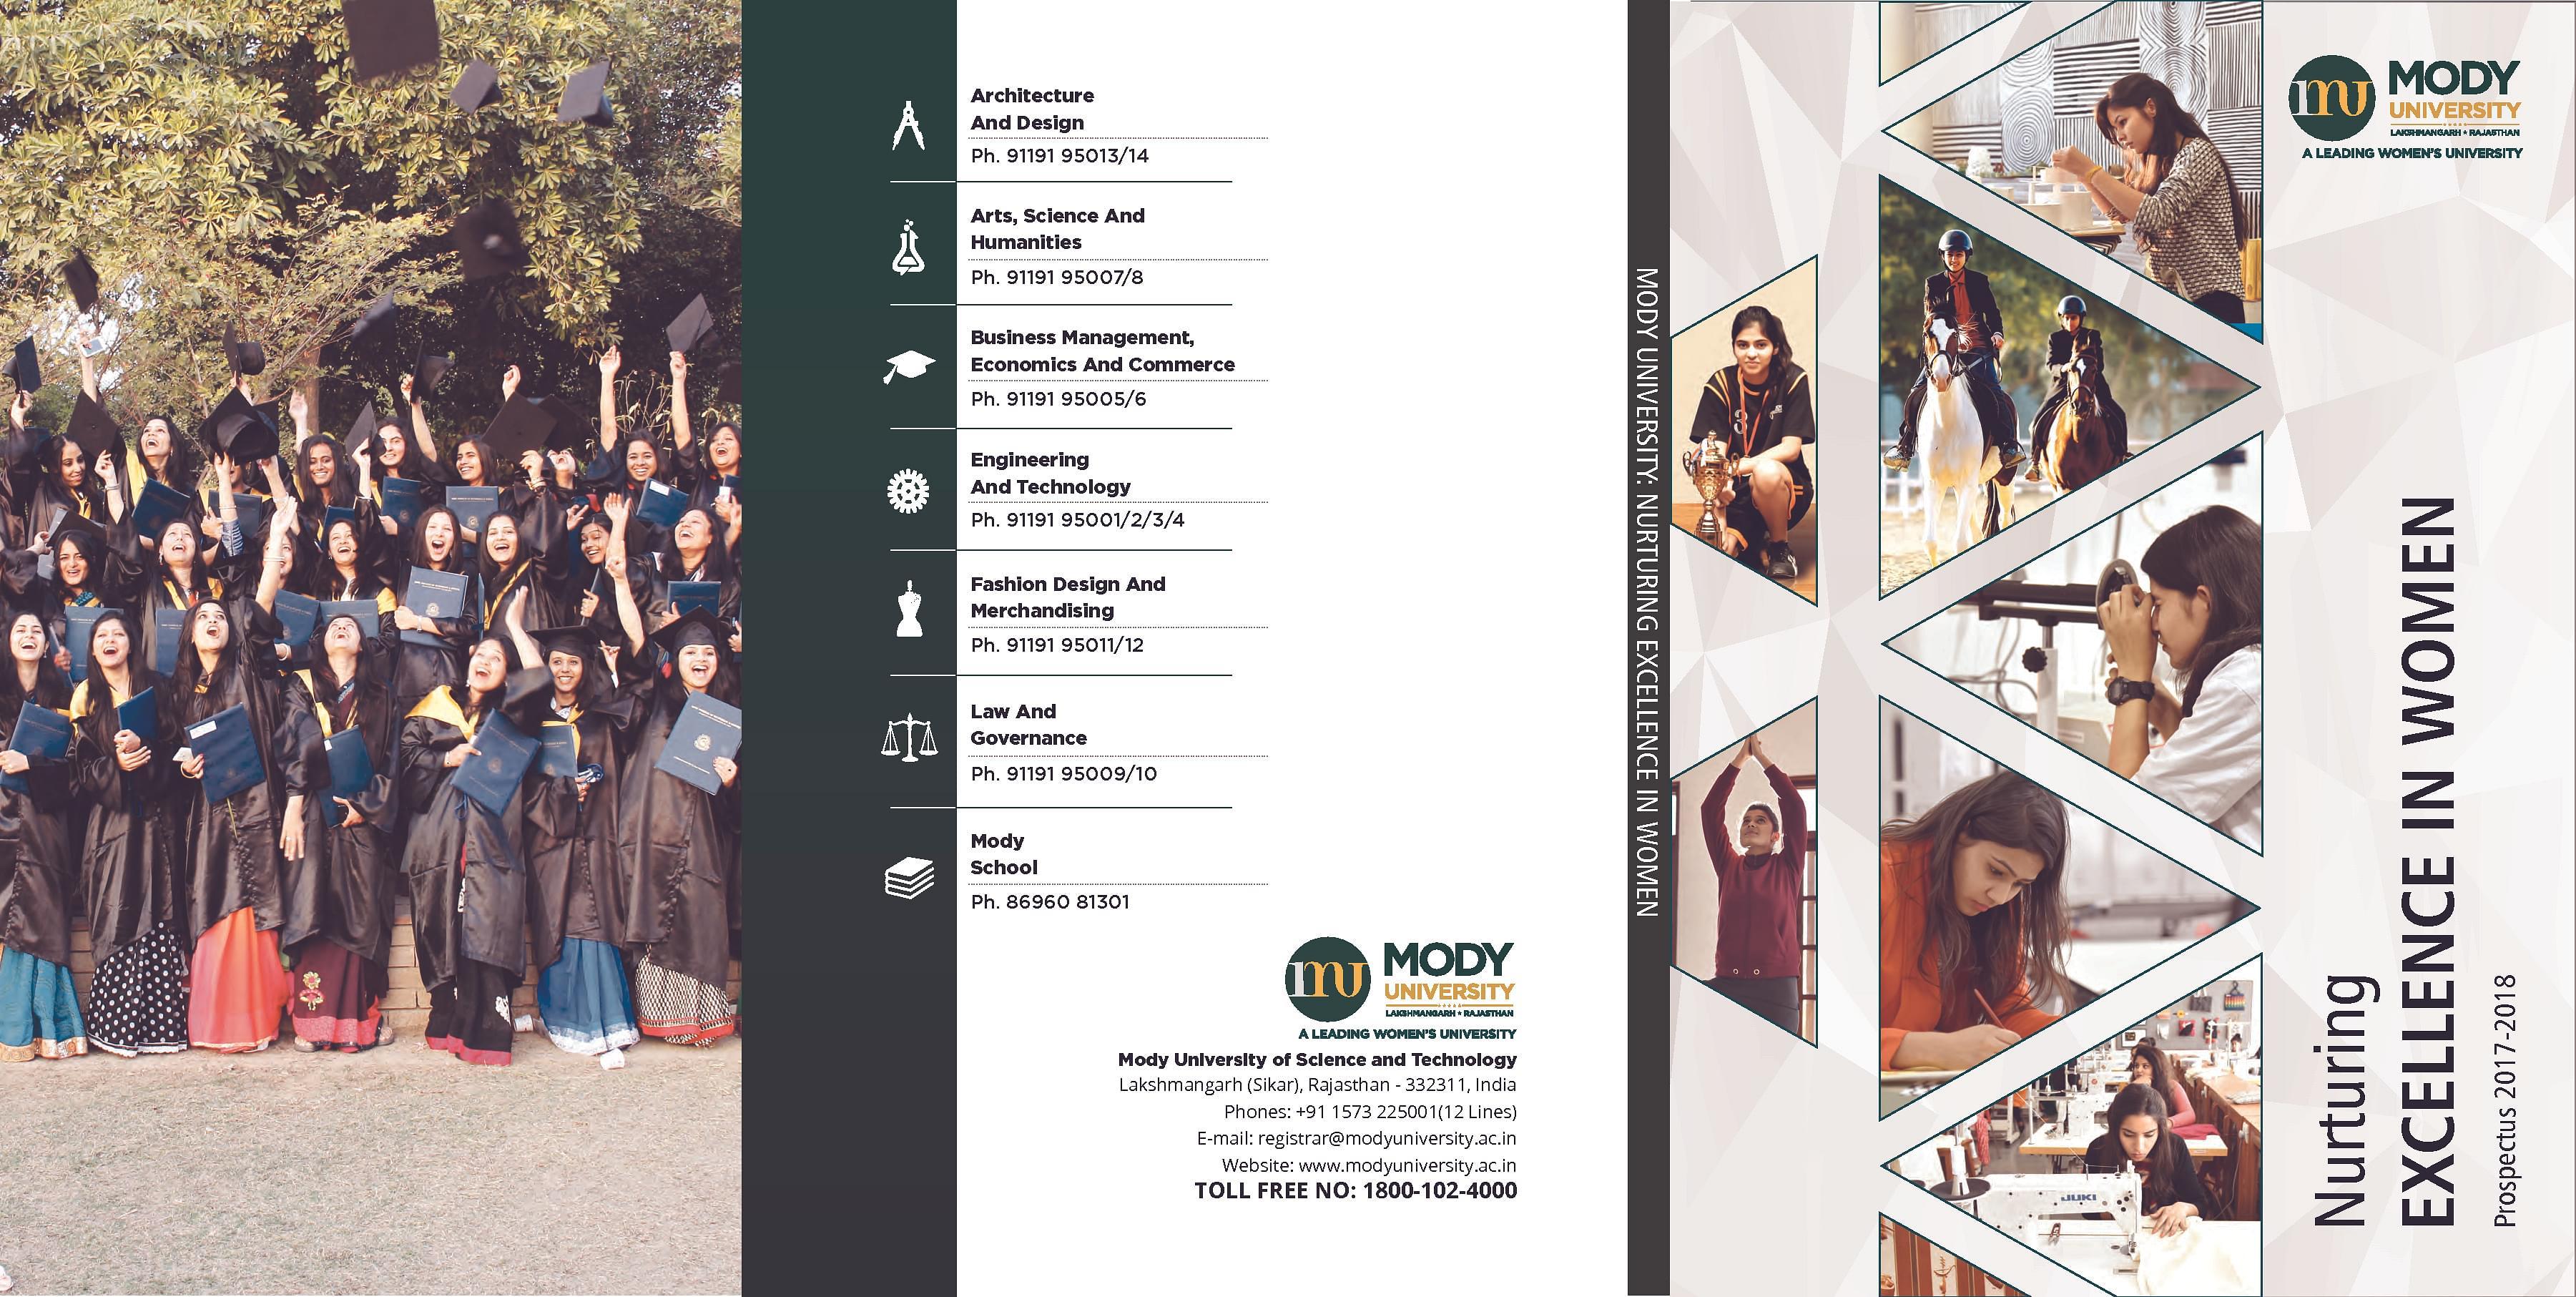 Mody University College Of Fashion Design And